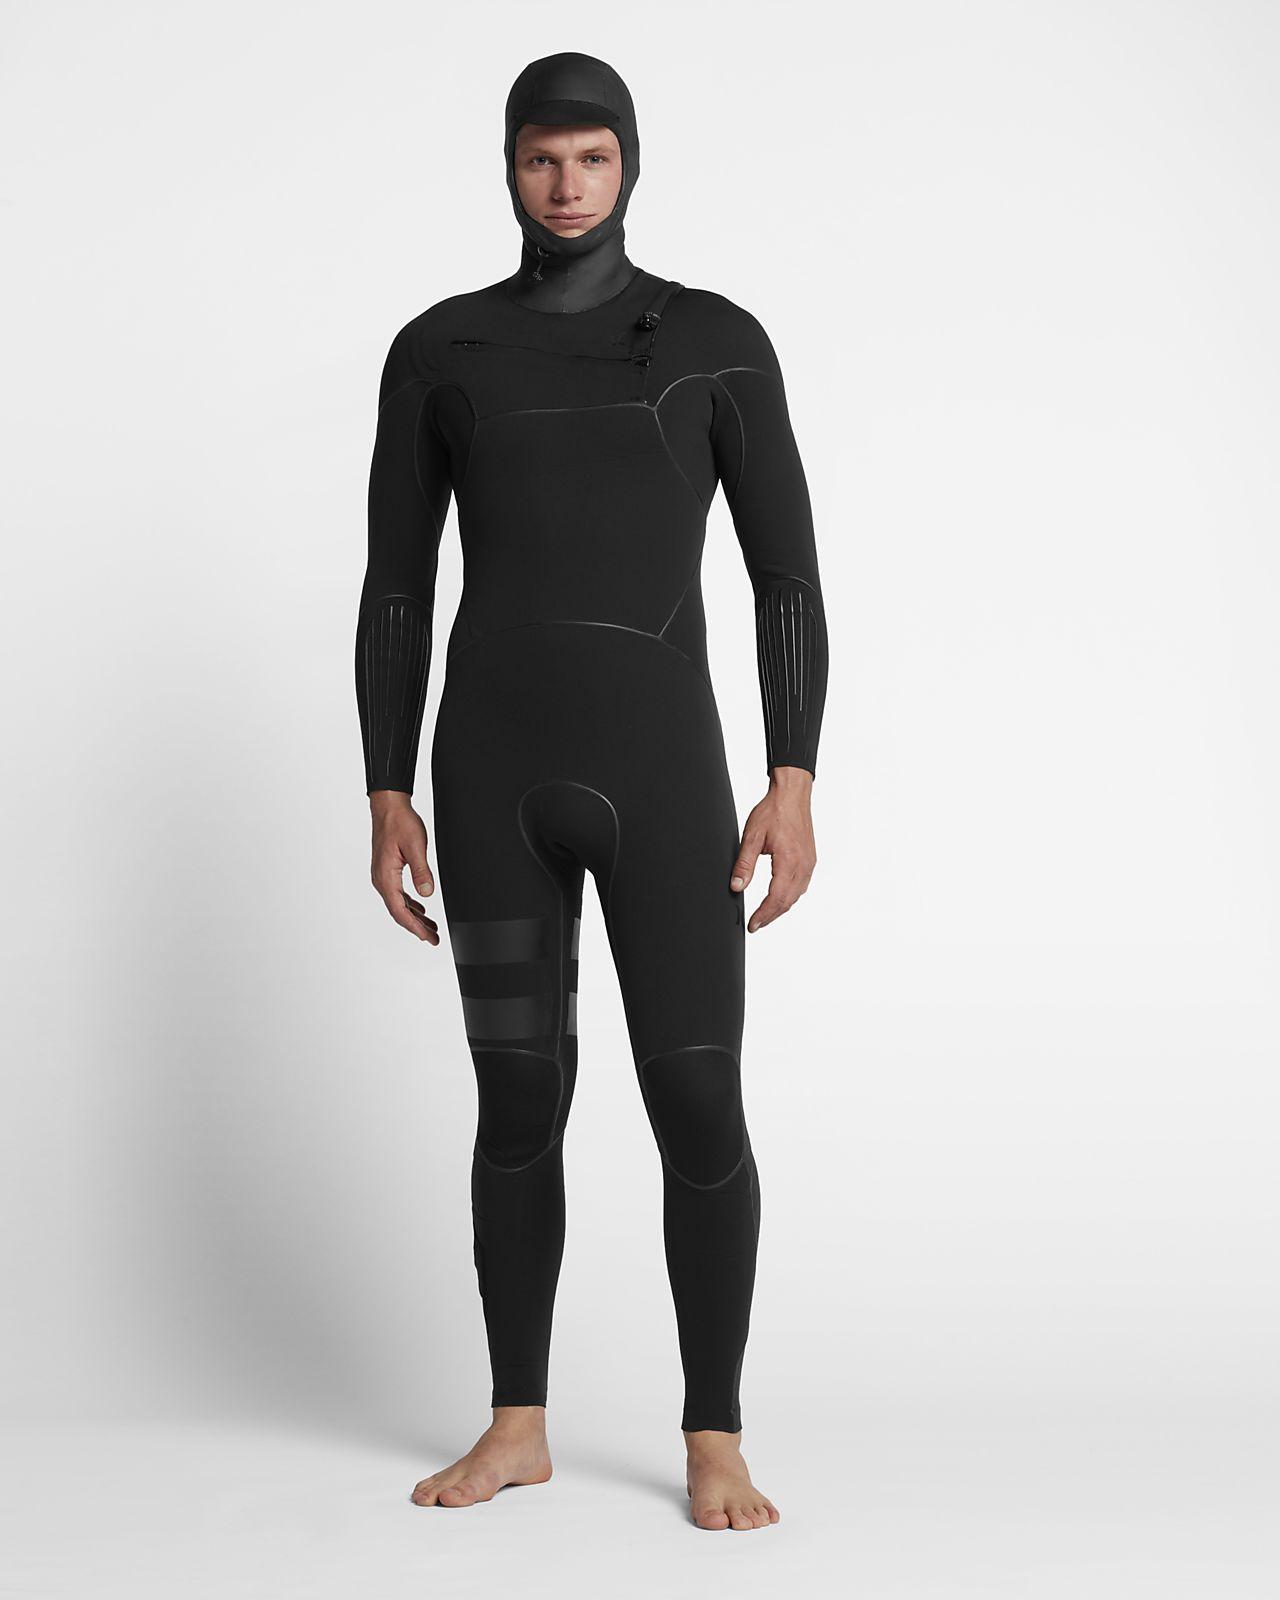 23bb8fb36a56a Hurley Advantage Max 5 3mm Fullsuit Men s Wetsuit. Nike.com AU